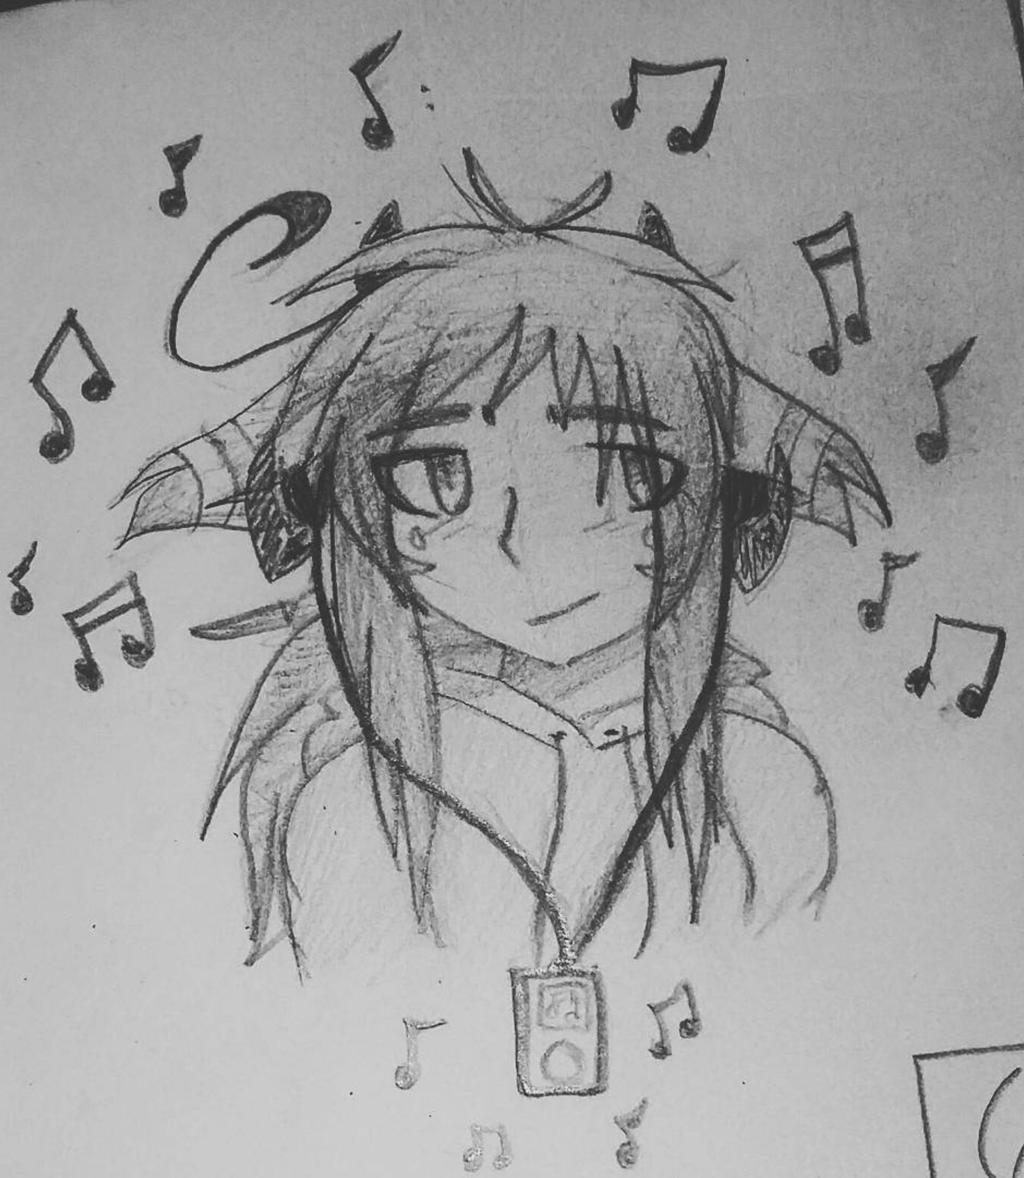 Zwelxia Listening to Music by Zwelx